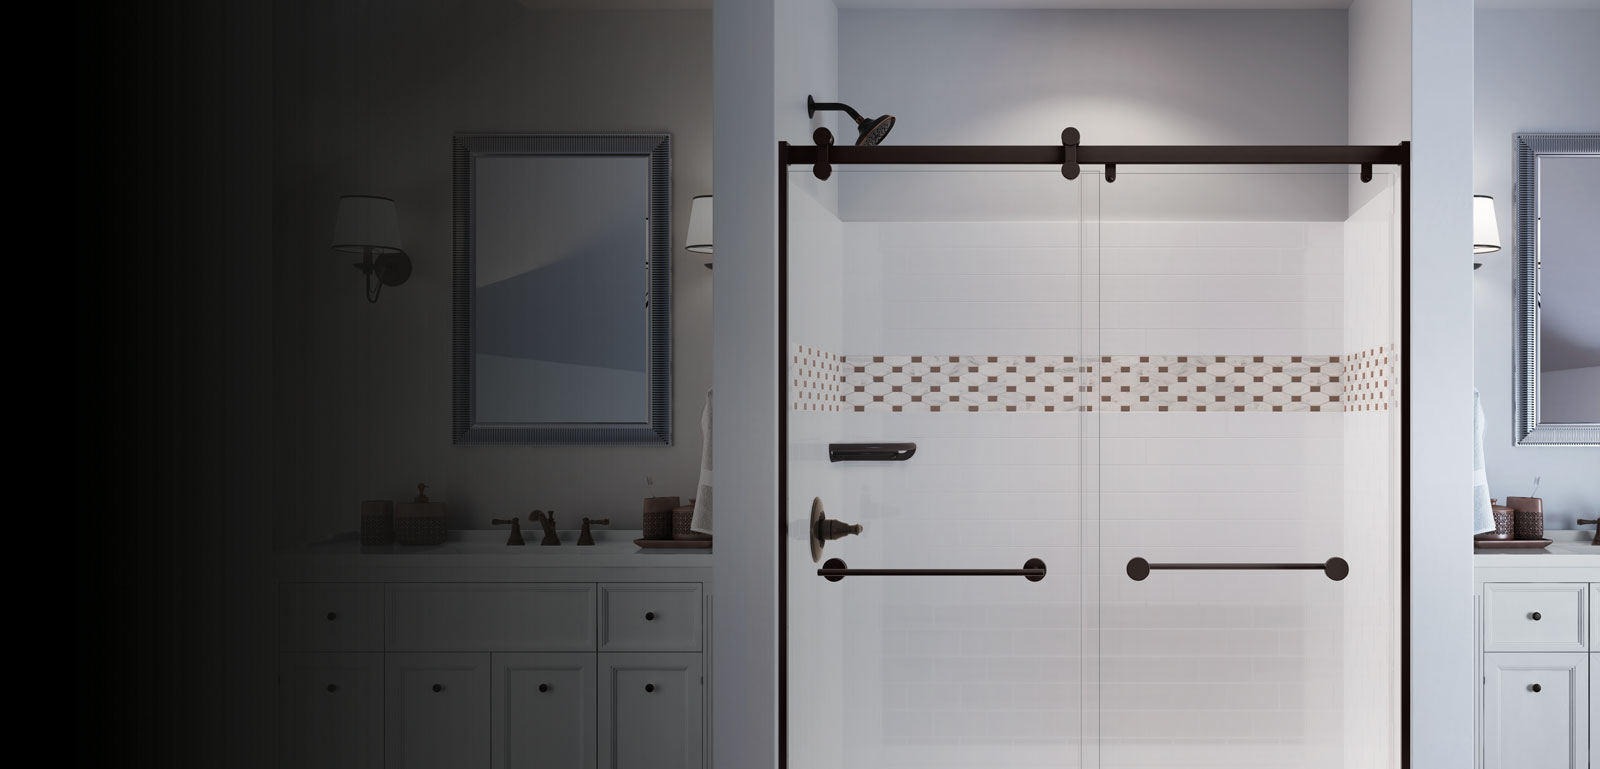 Eco Toilets The Future of Bathrooms